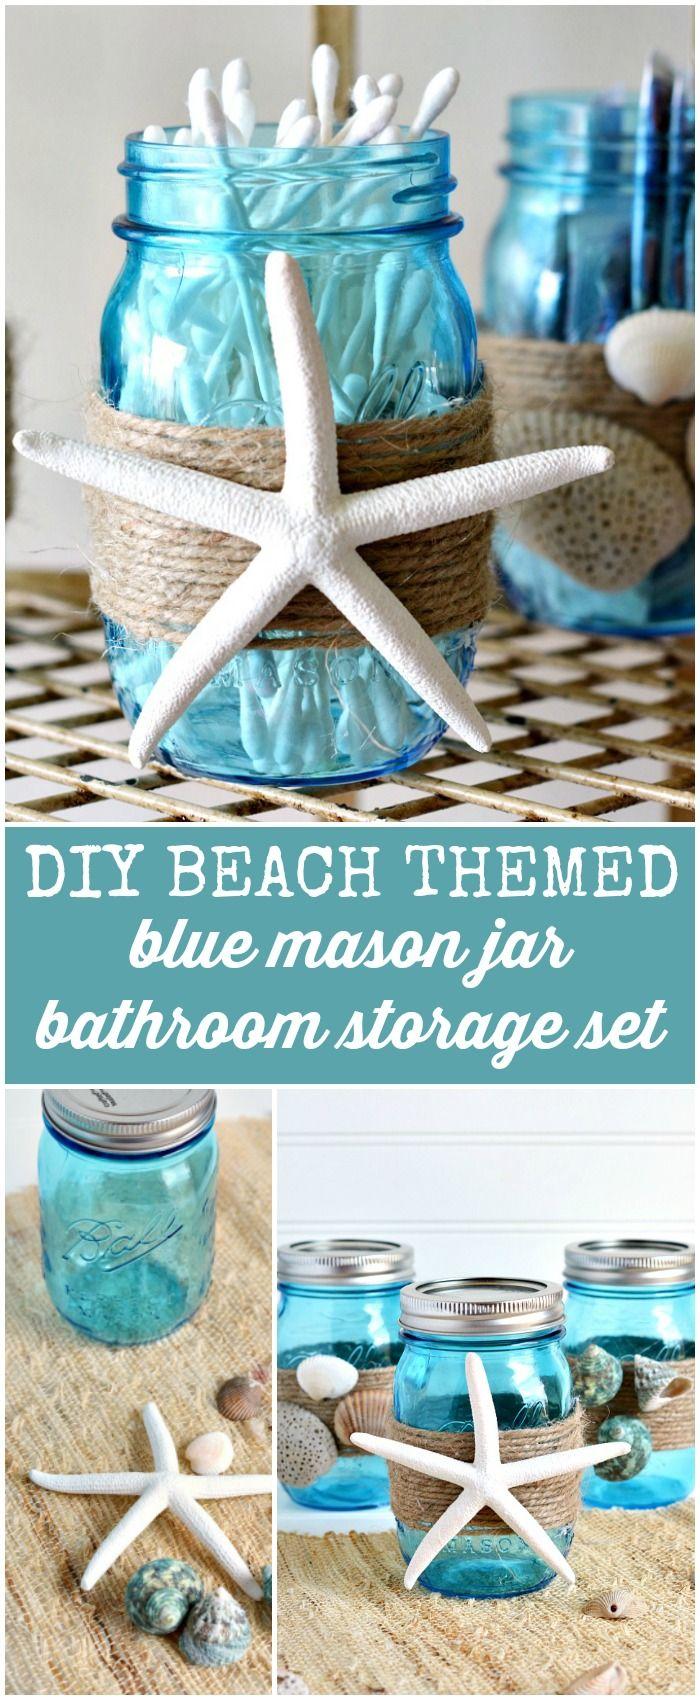 How To Make A Diy Beach Themed Blue Ball Mason Jar